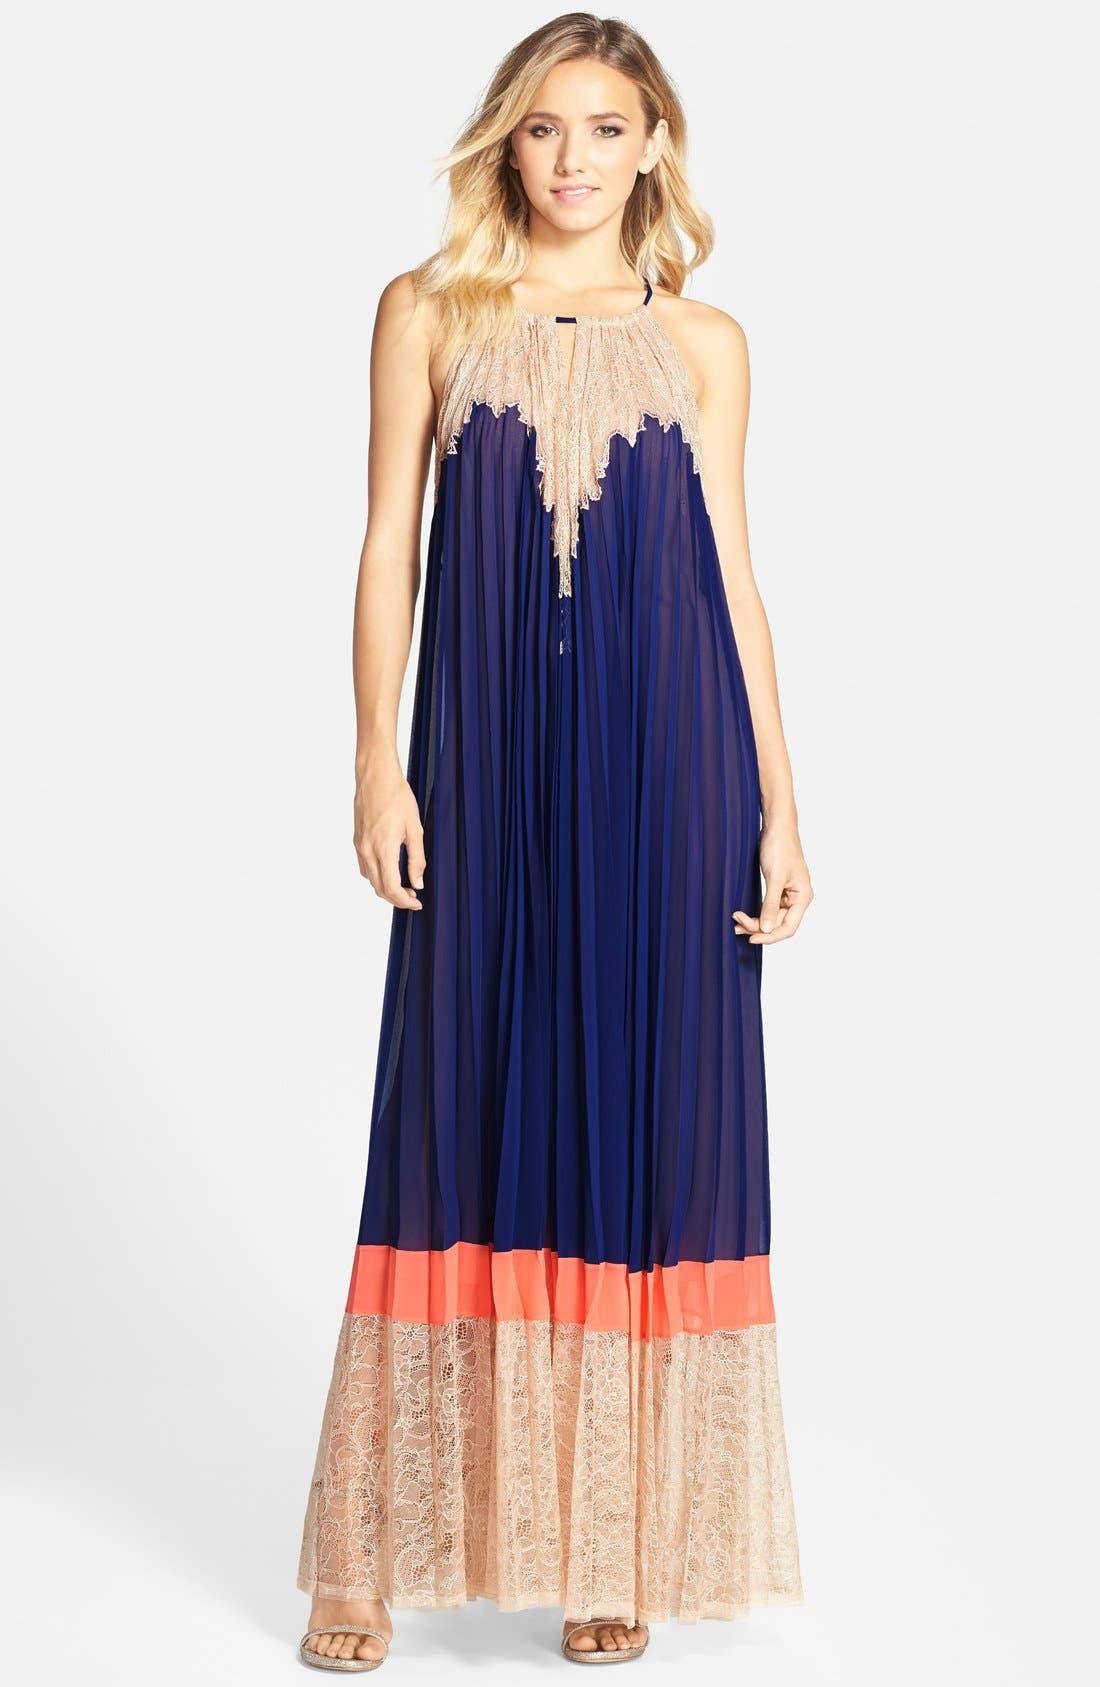 Main Image - BCBGMAXAZRIA 'Brieena' Colorblock Sleeveless Maxi Dress